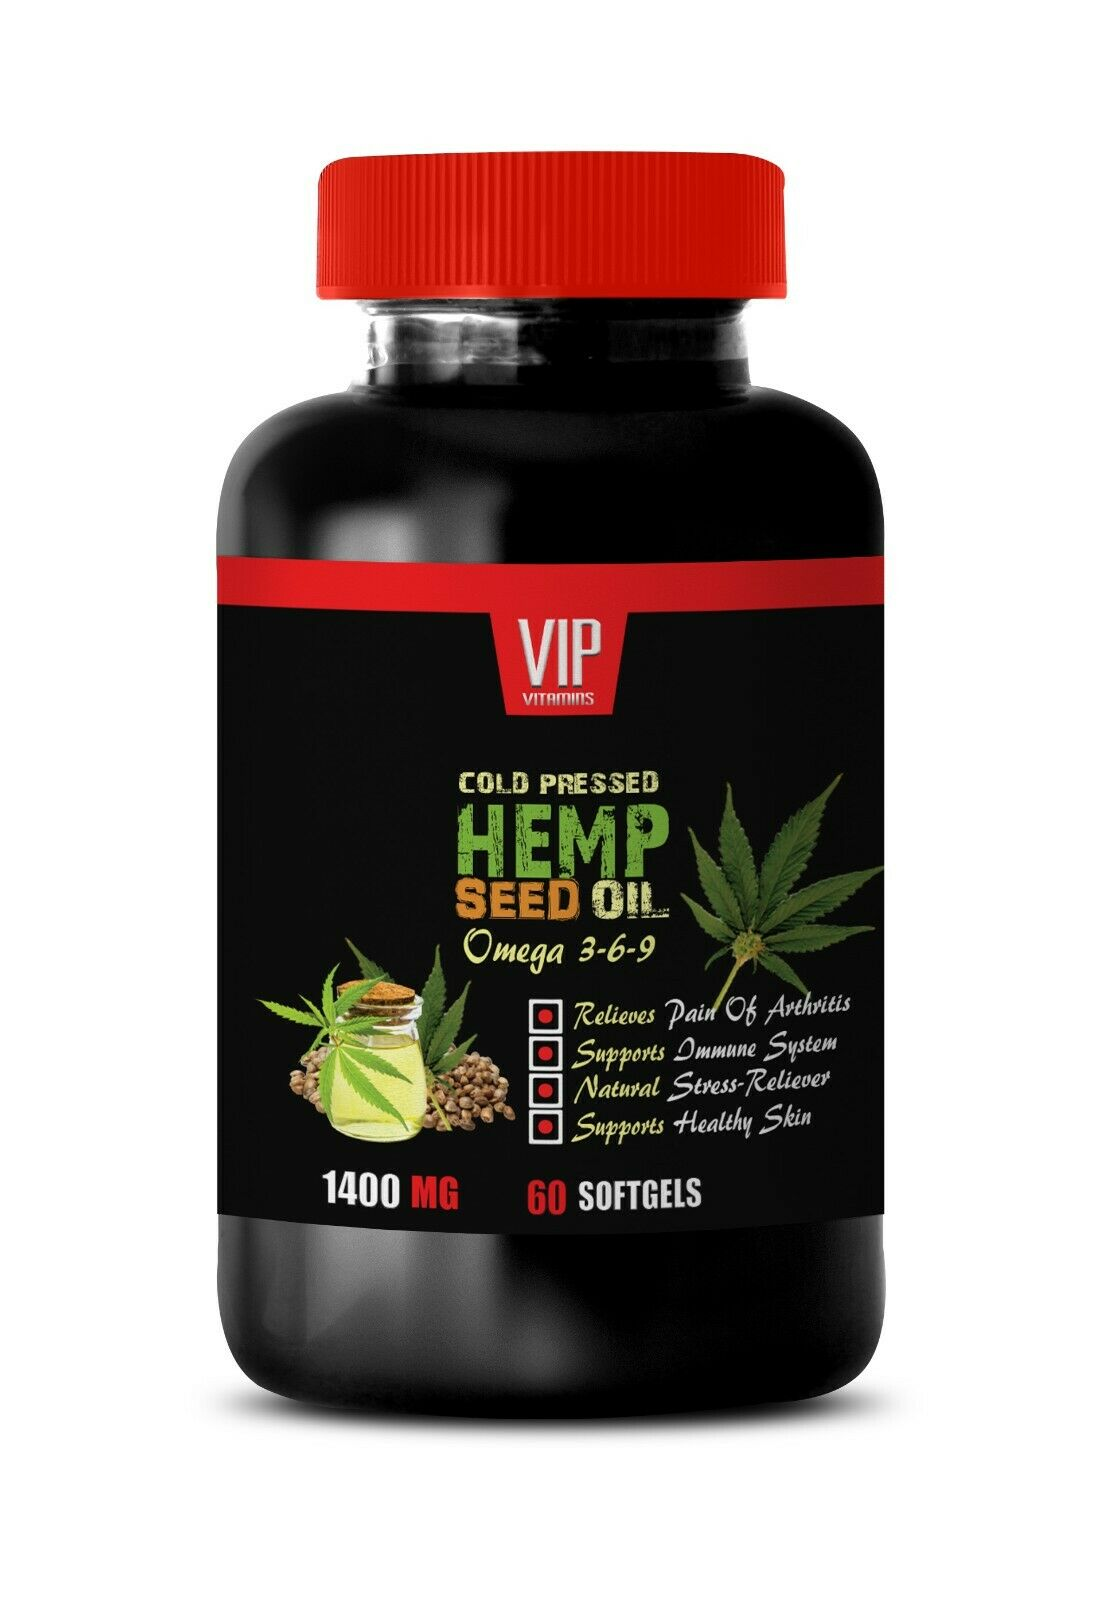 omega 3-6-9 - Hemp Seed Oil 1400mg (1) - antioxidants for skin revitalization